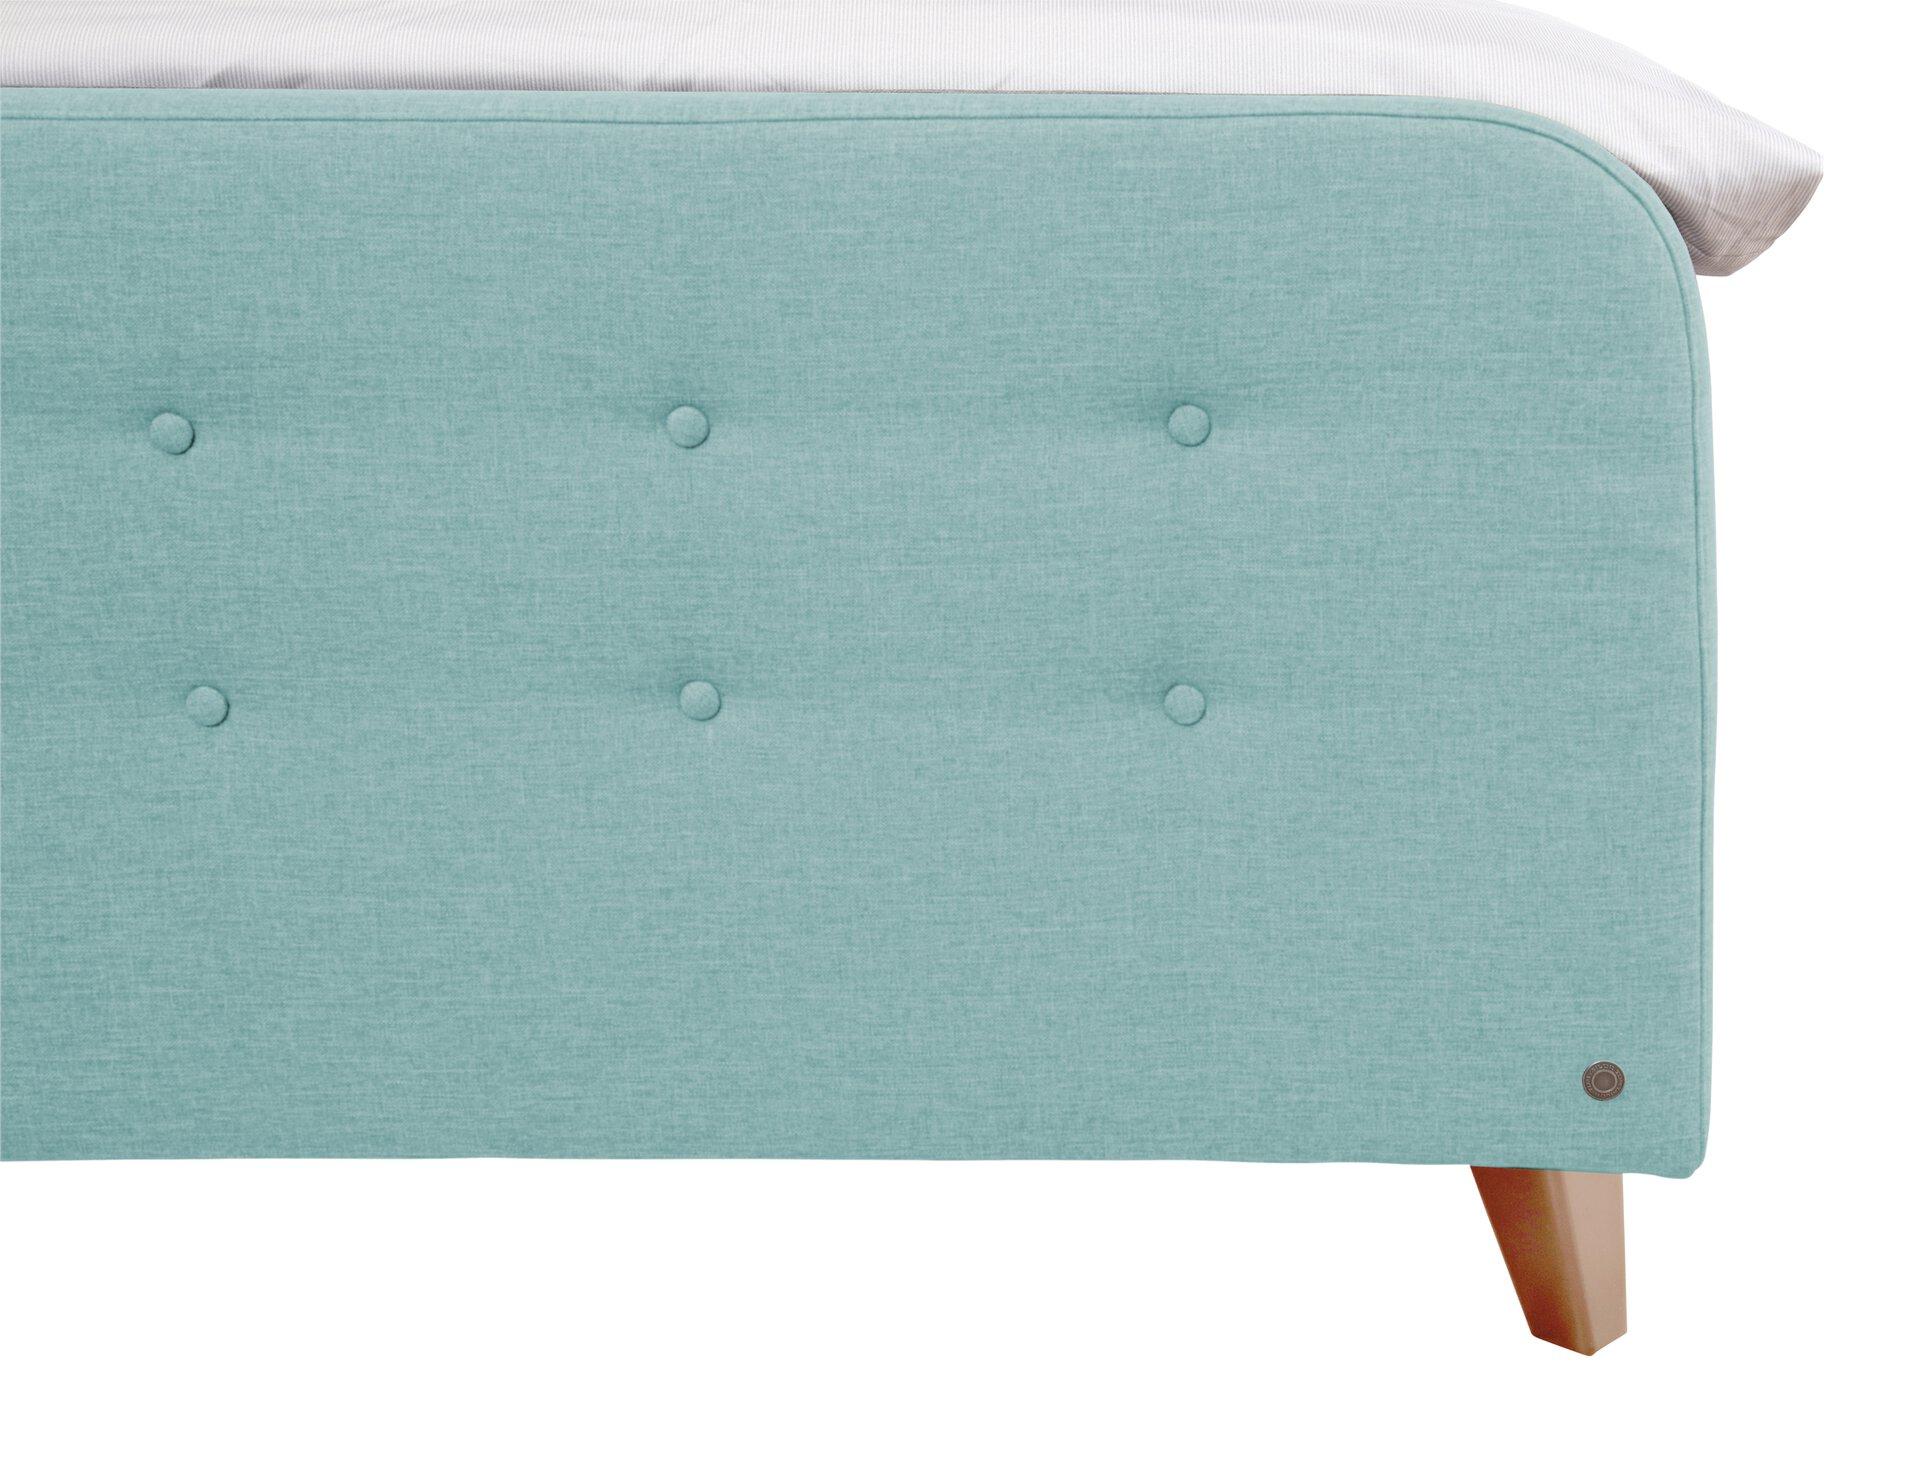 Boxspringbett NORDIC BOX Tom Tailor Textil Blau 182 x 105 x 216 cm